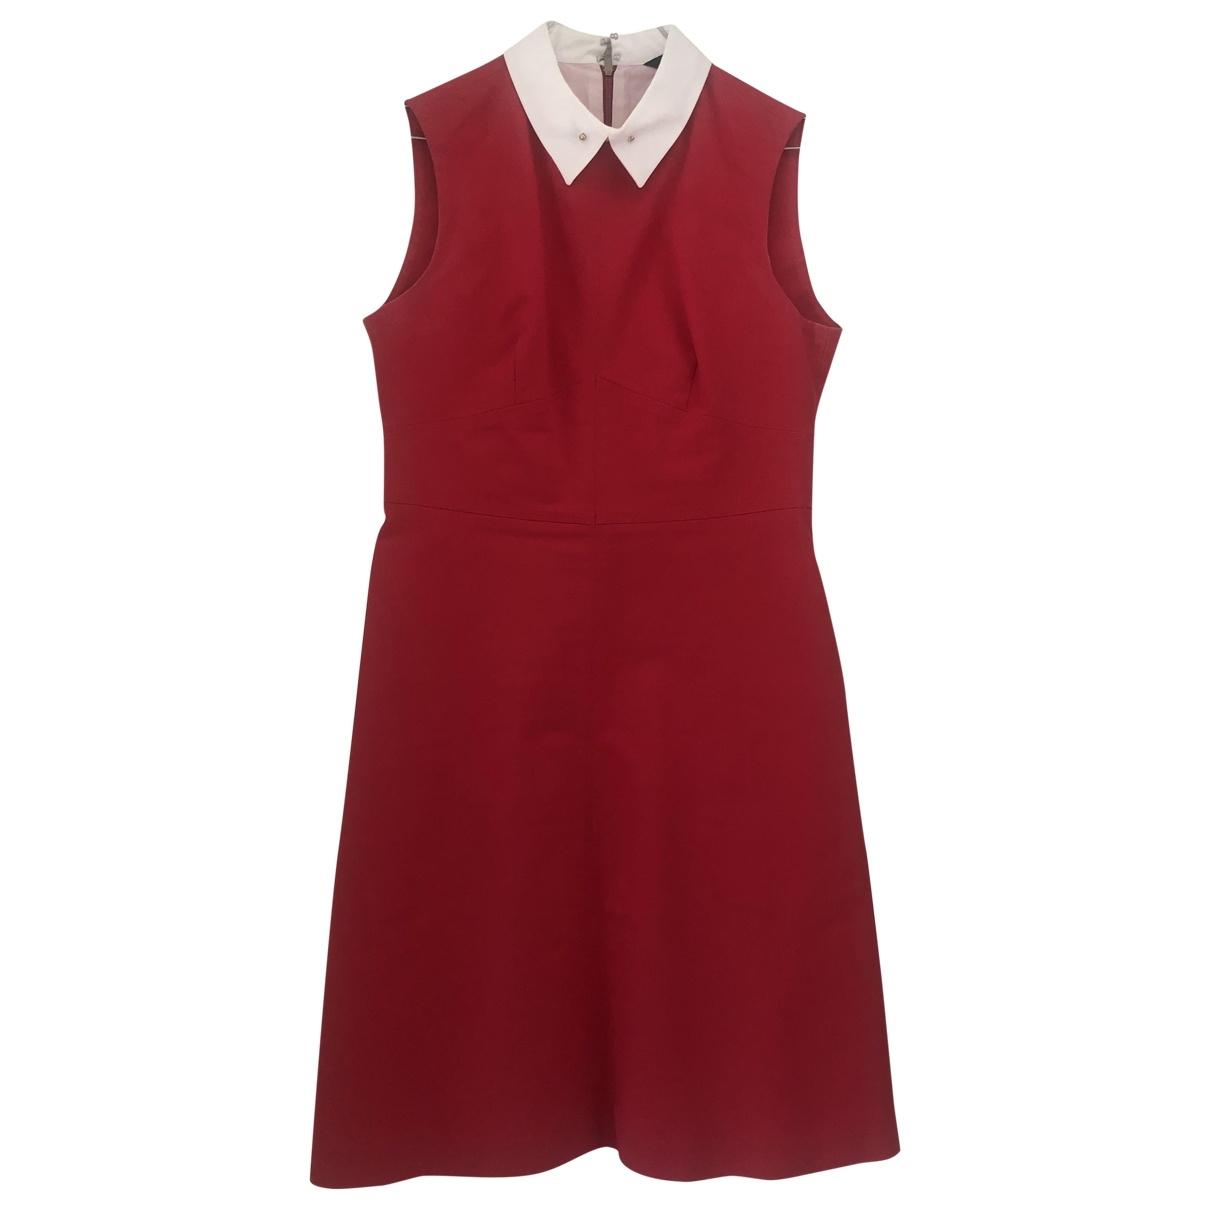 Tara Jarmon \N Red Cotton - elasthane dress for Women 38 FR